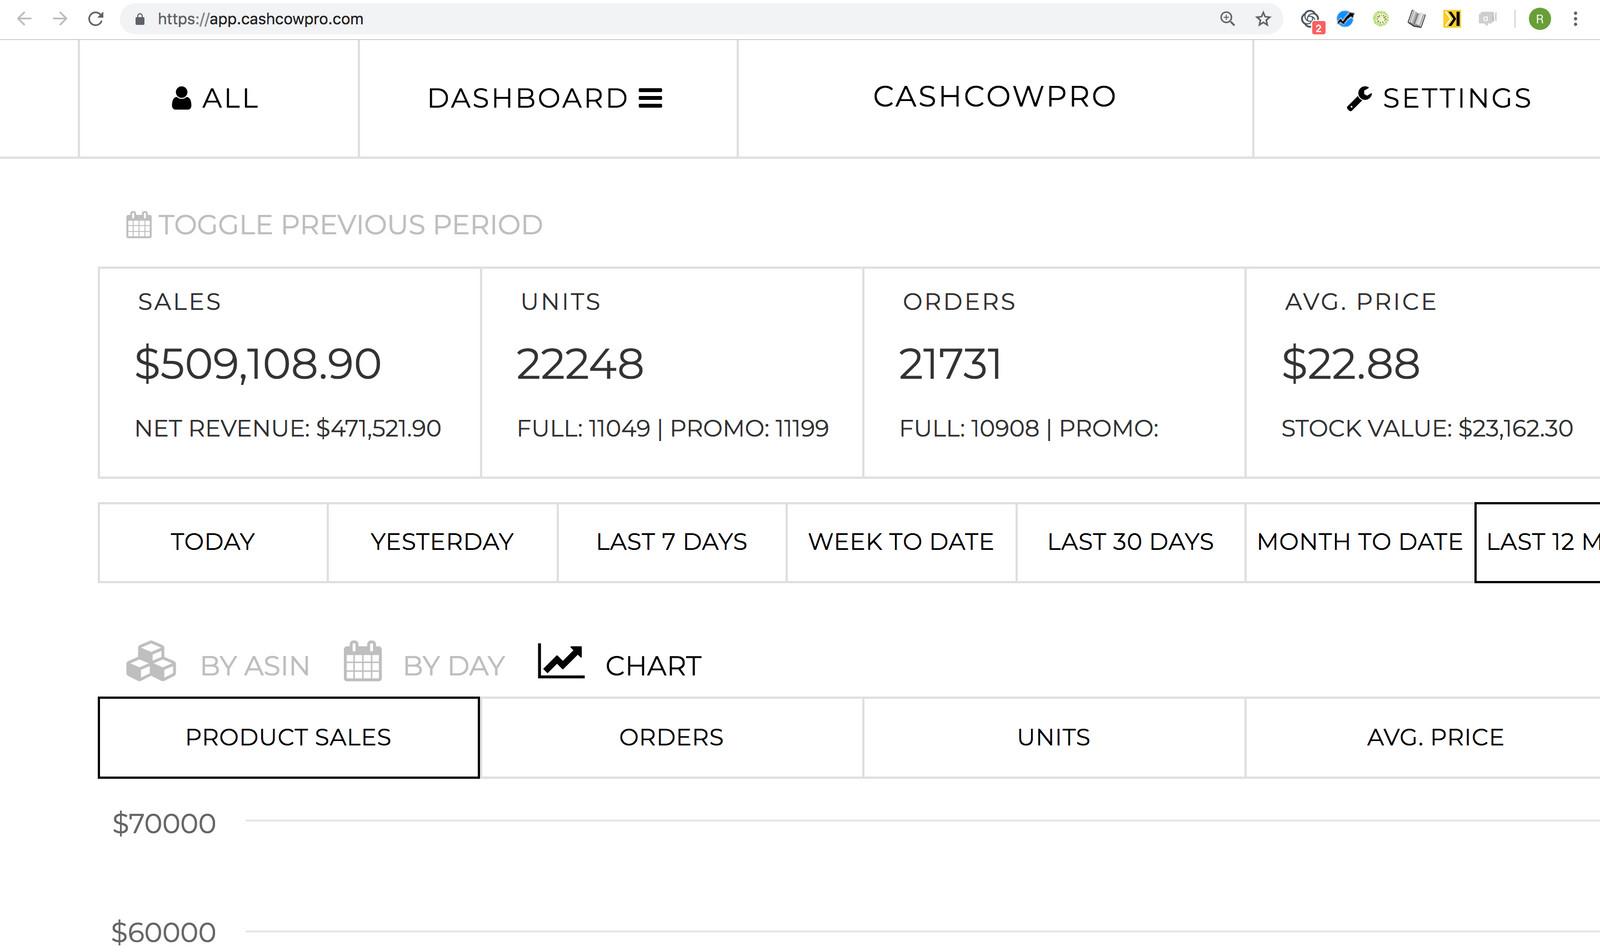 cashcowpro discount